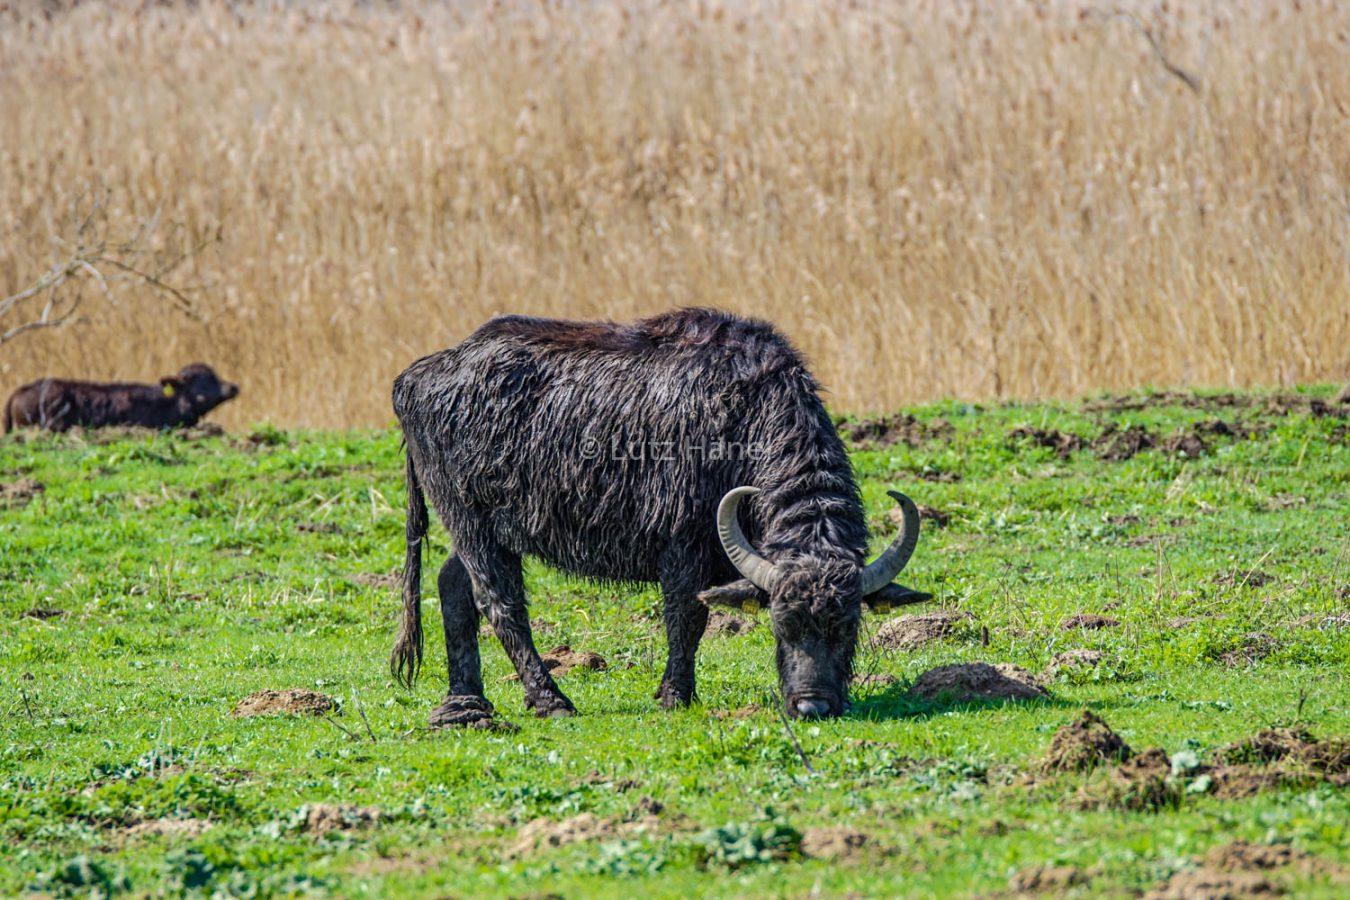 Löwenzahnpfad kann man die Wasserbüffel wunderbar beobachten